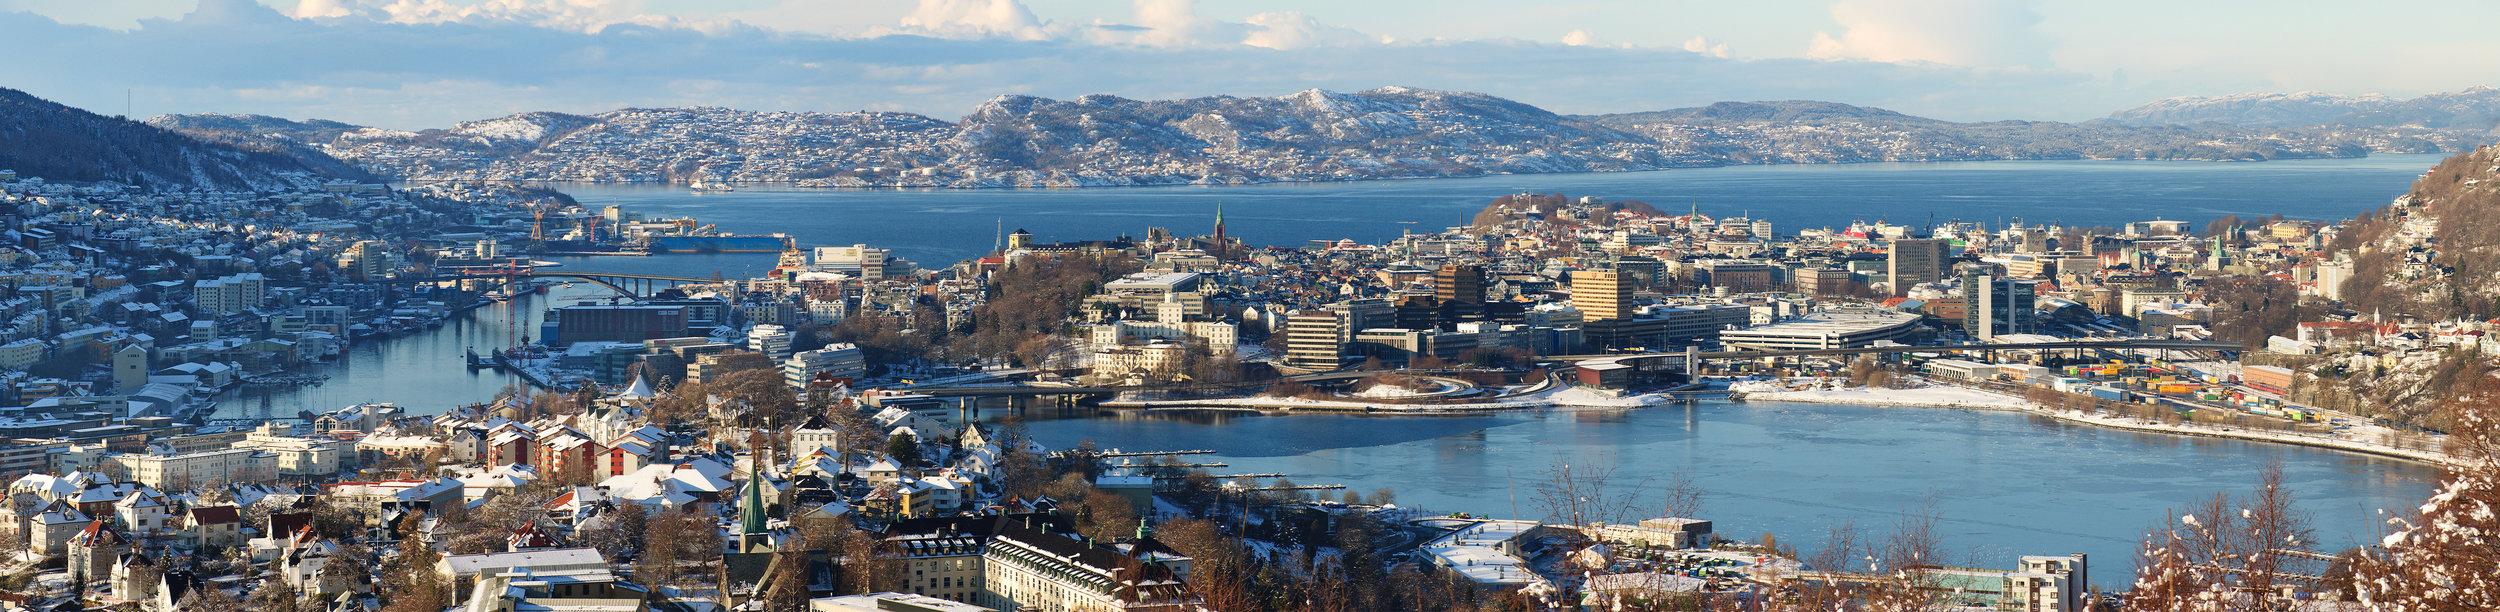 Bergen_city_centre_and_surroundings_Panorama_edited.jpg